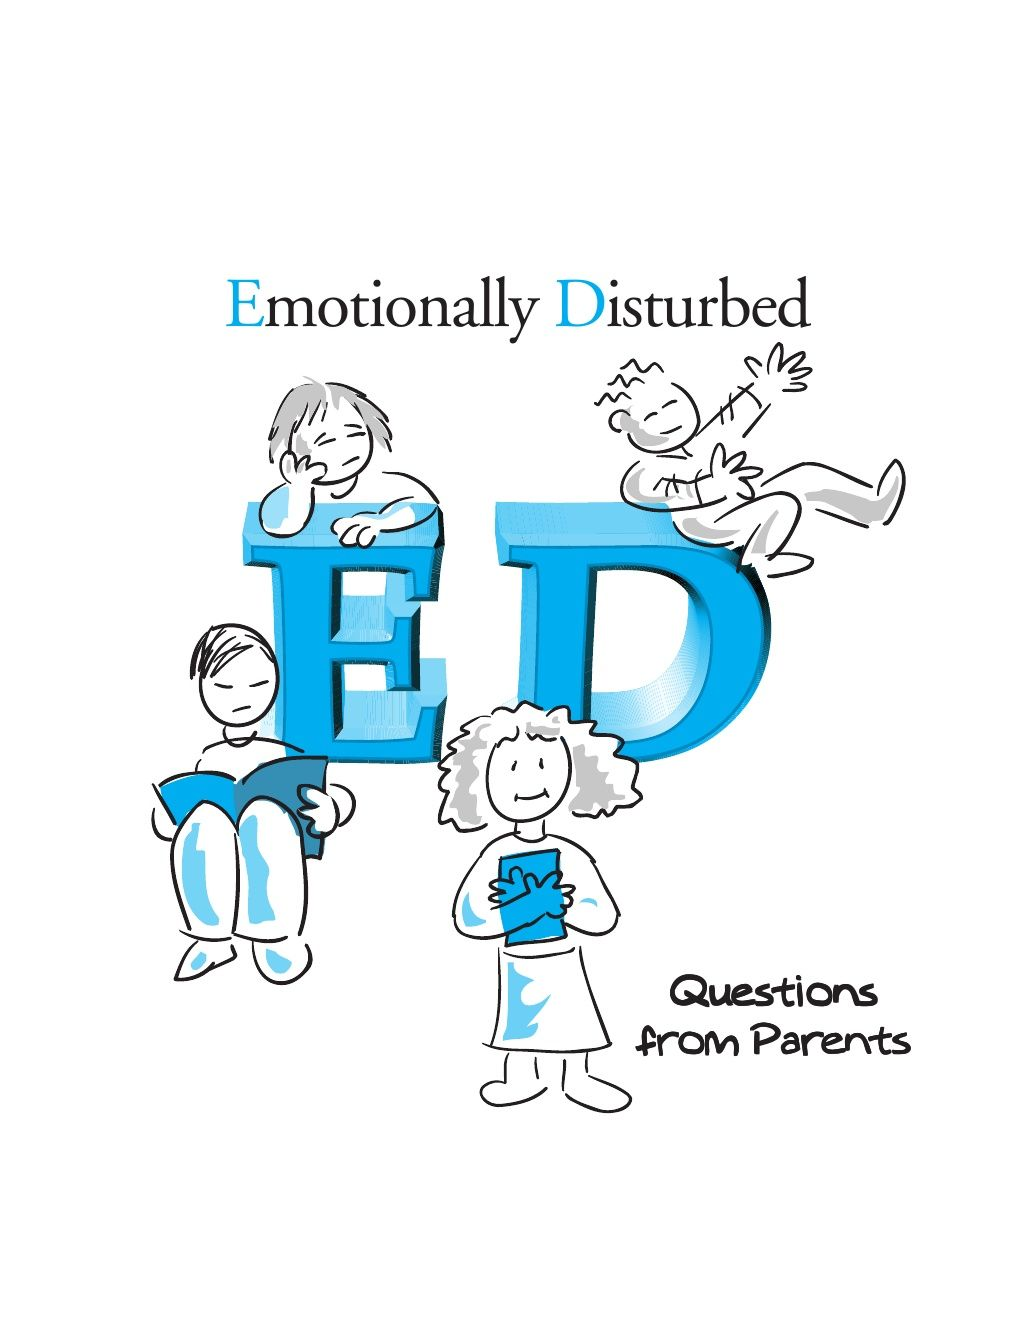 Emotionally Disturbed Students At >> Parent Information On Emotional Disturbance By Mstenorio Via